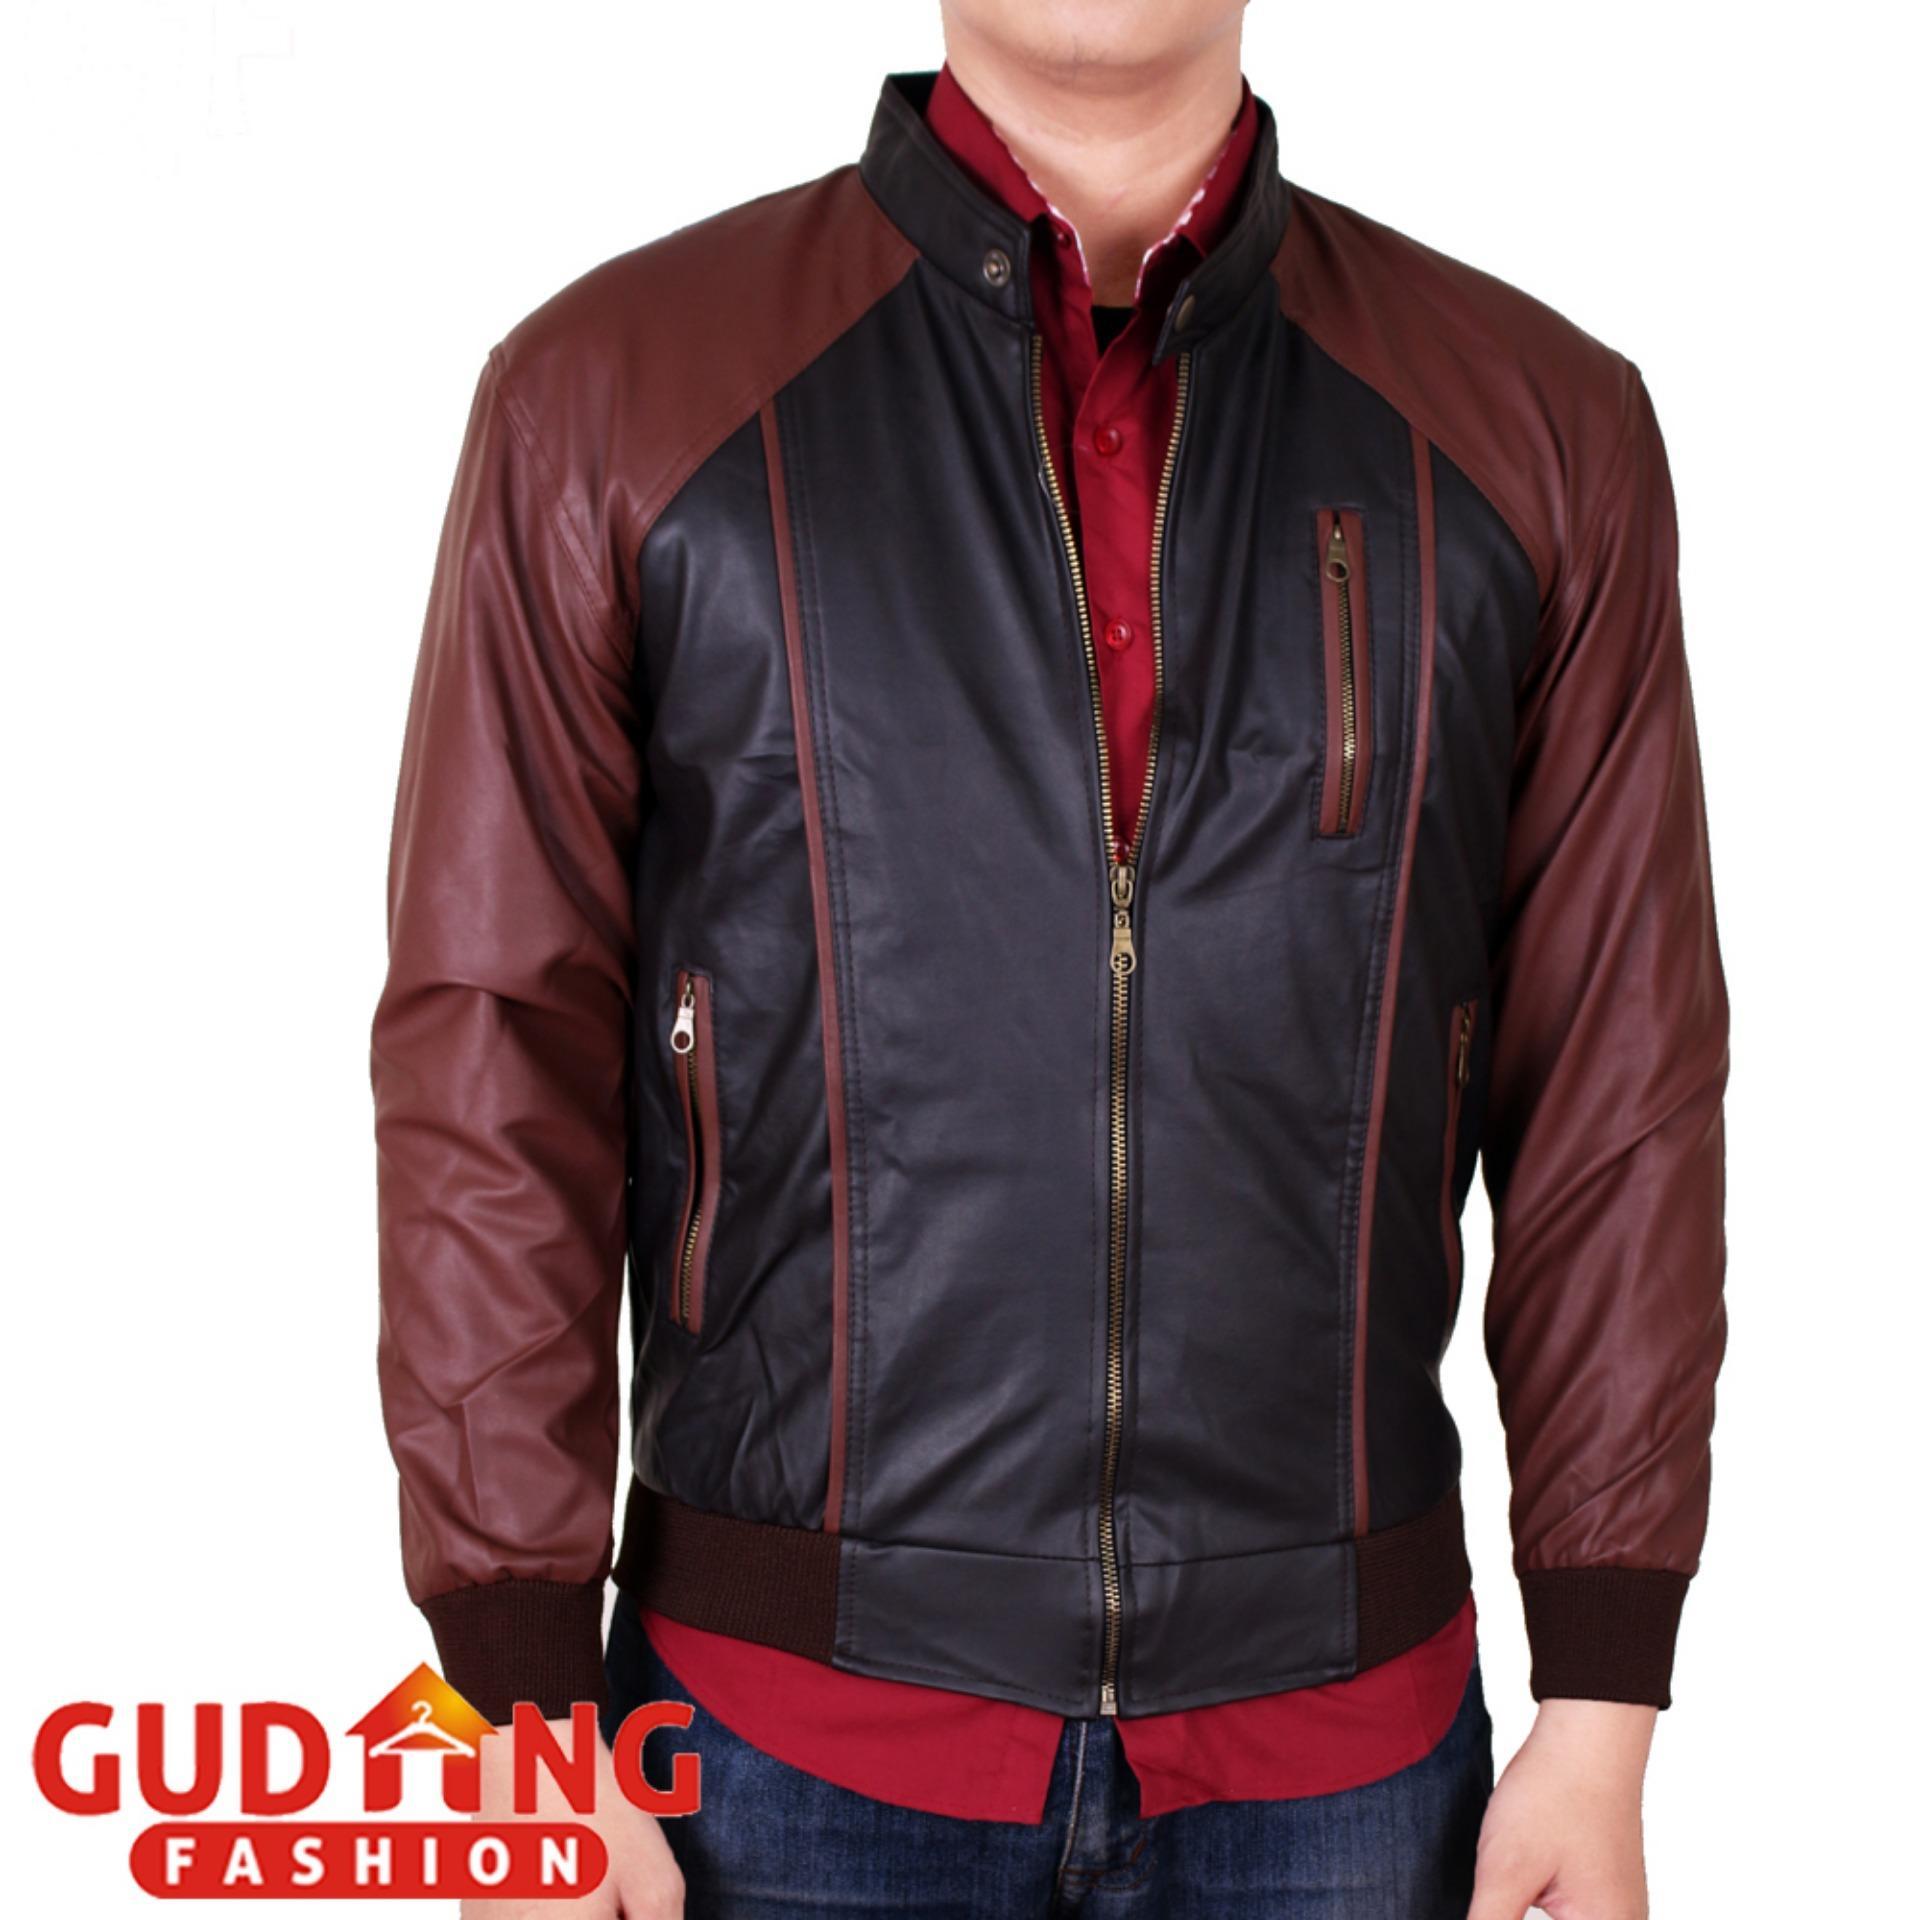 Pencarian Termurah Gudang Fashion - Jaket Kulit Oscar Kombinasi Pria - Hitam  Kombinasi Coklat Tua harga 64268e59be